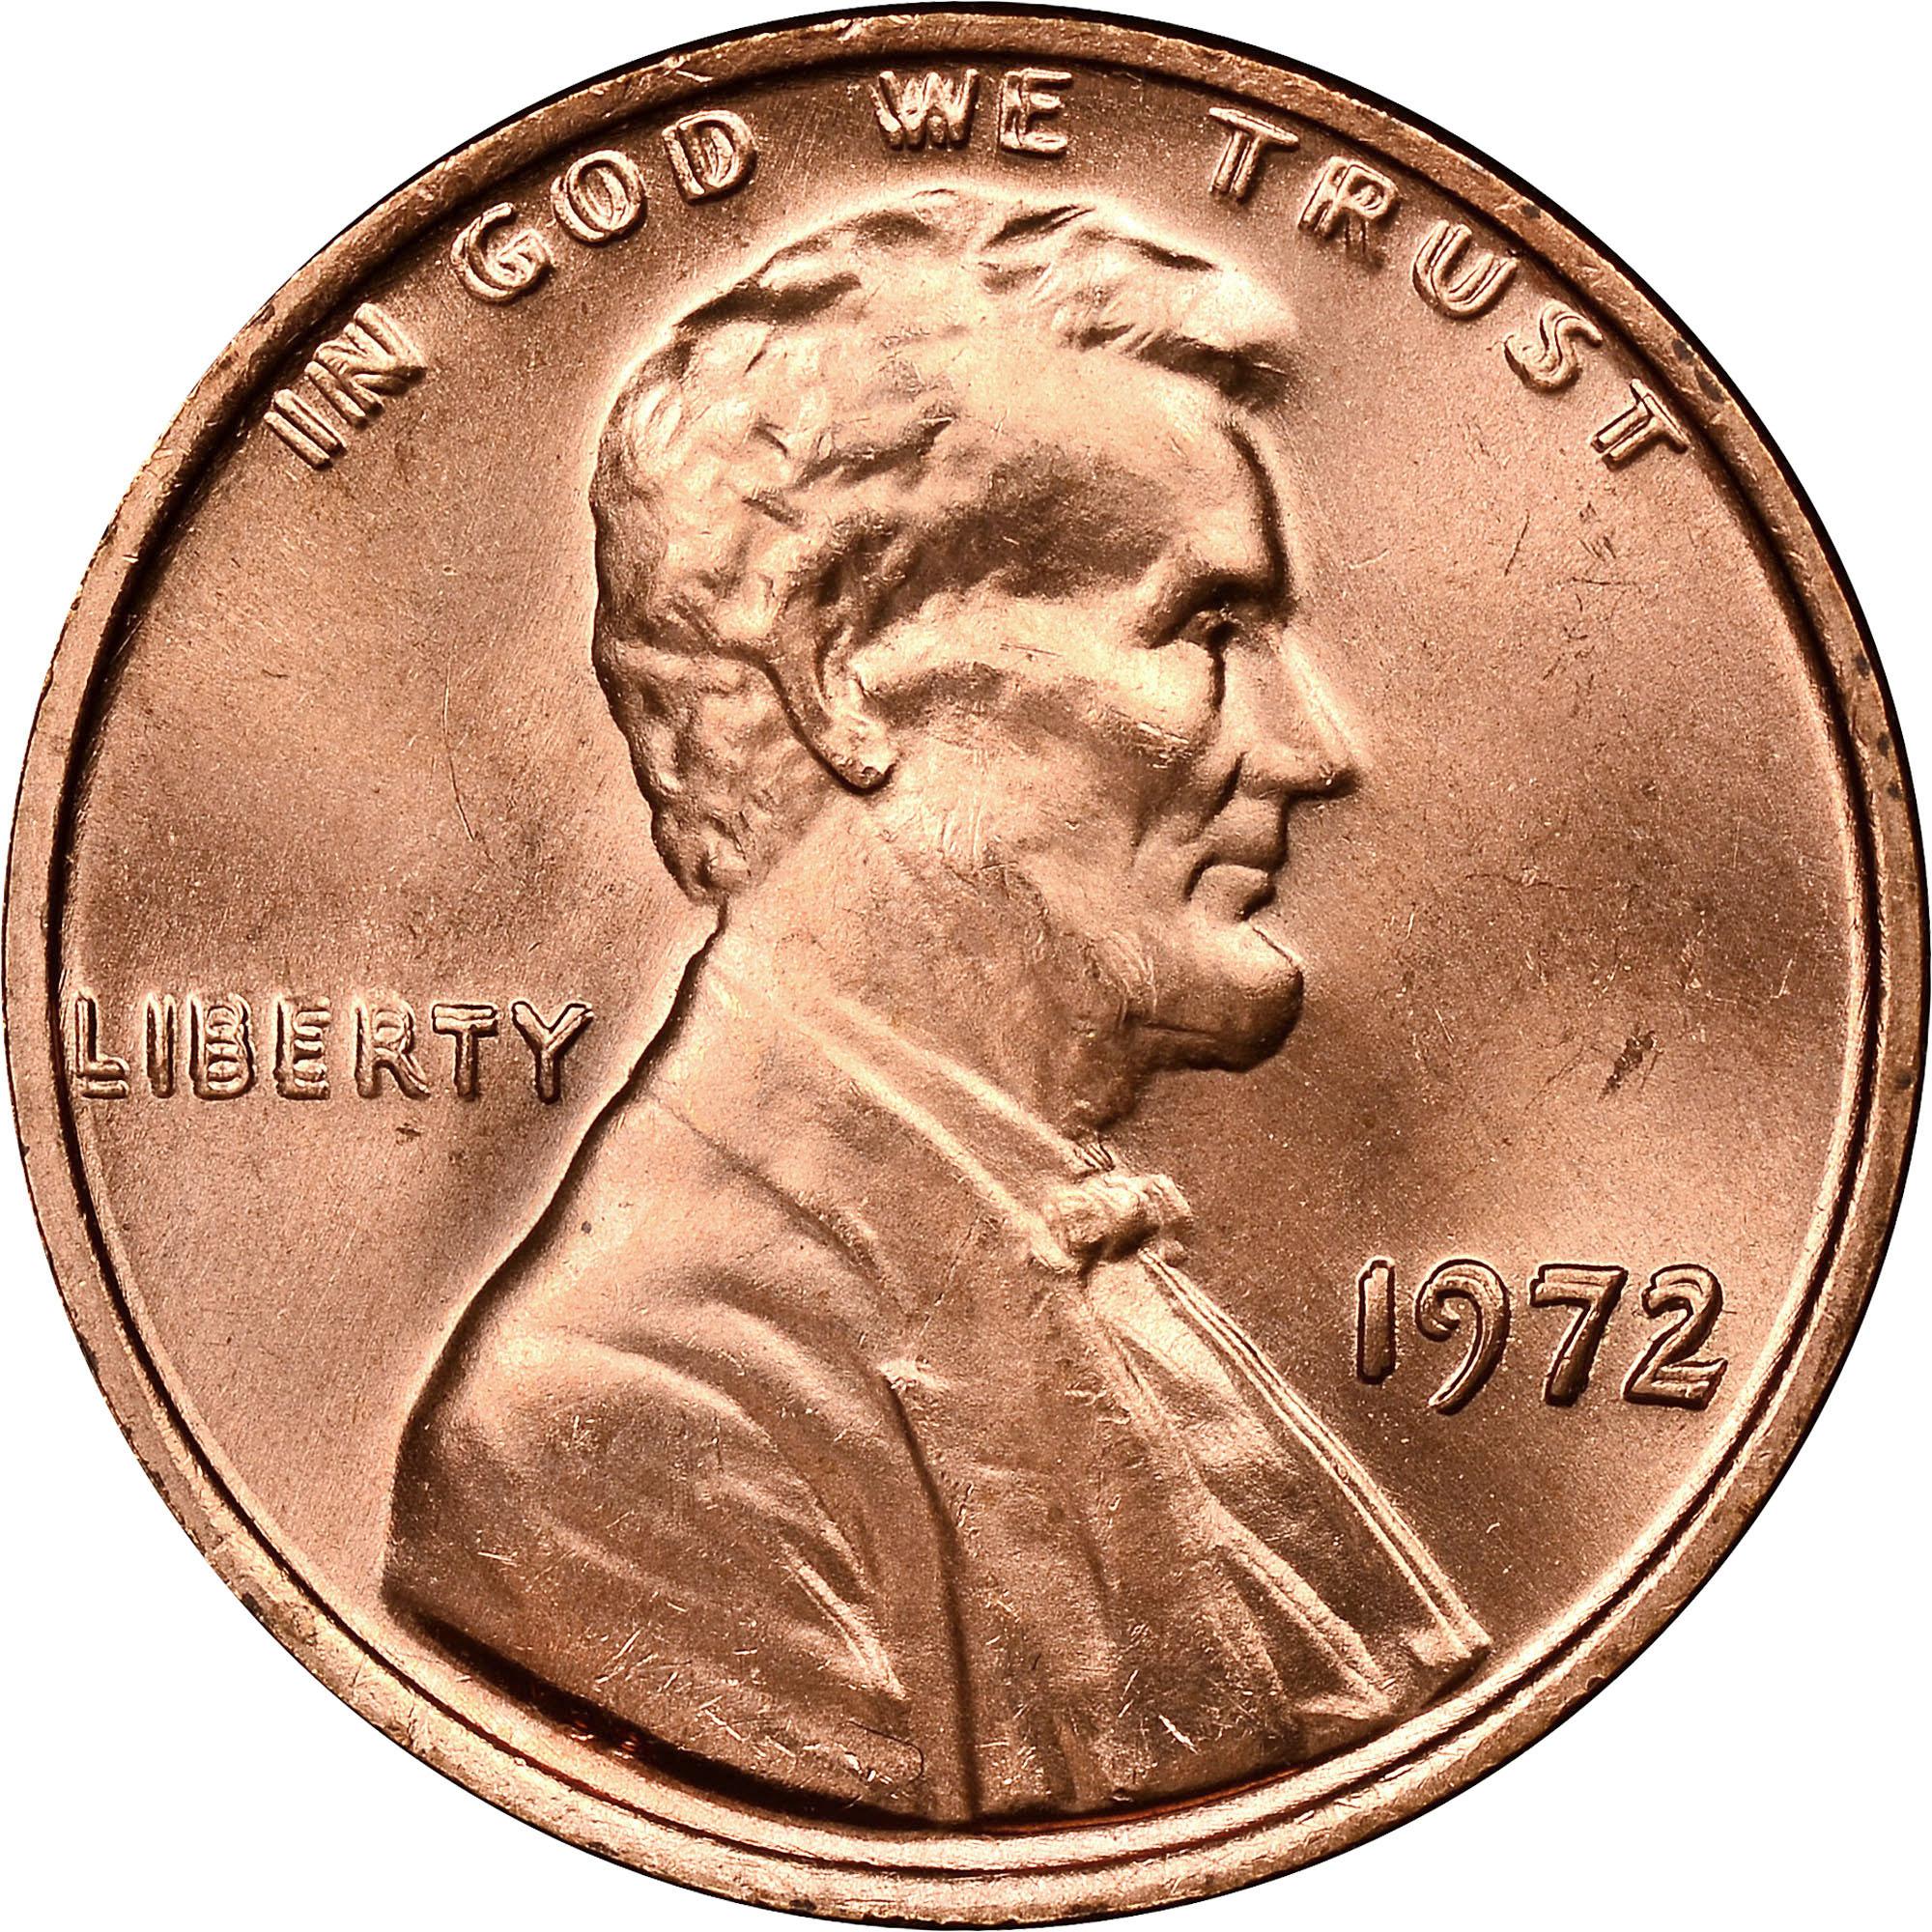 1959 D Lincoln Penny 1960 D D LINCOLN MEMORIAL PENNY RPM